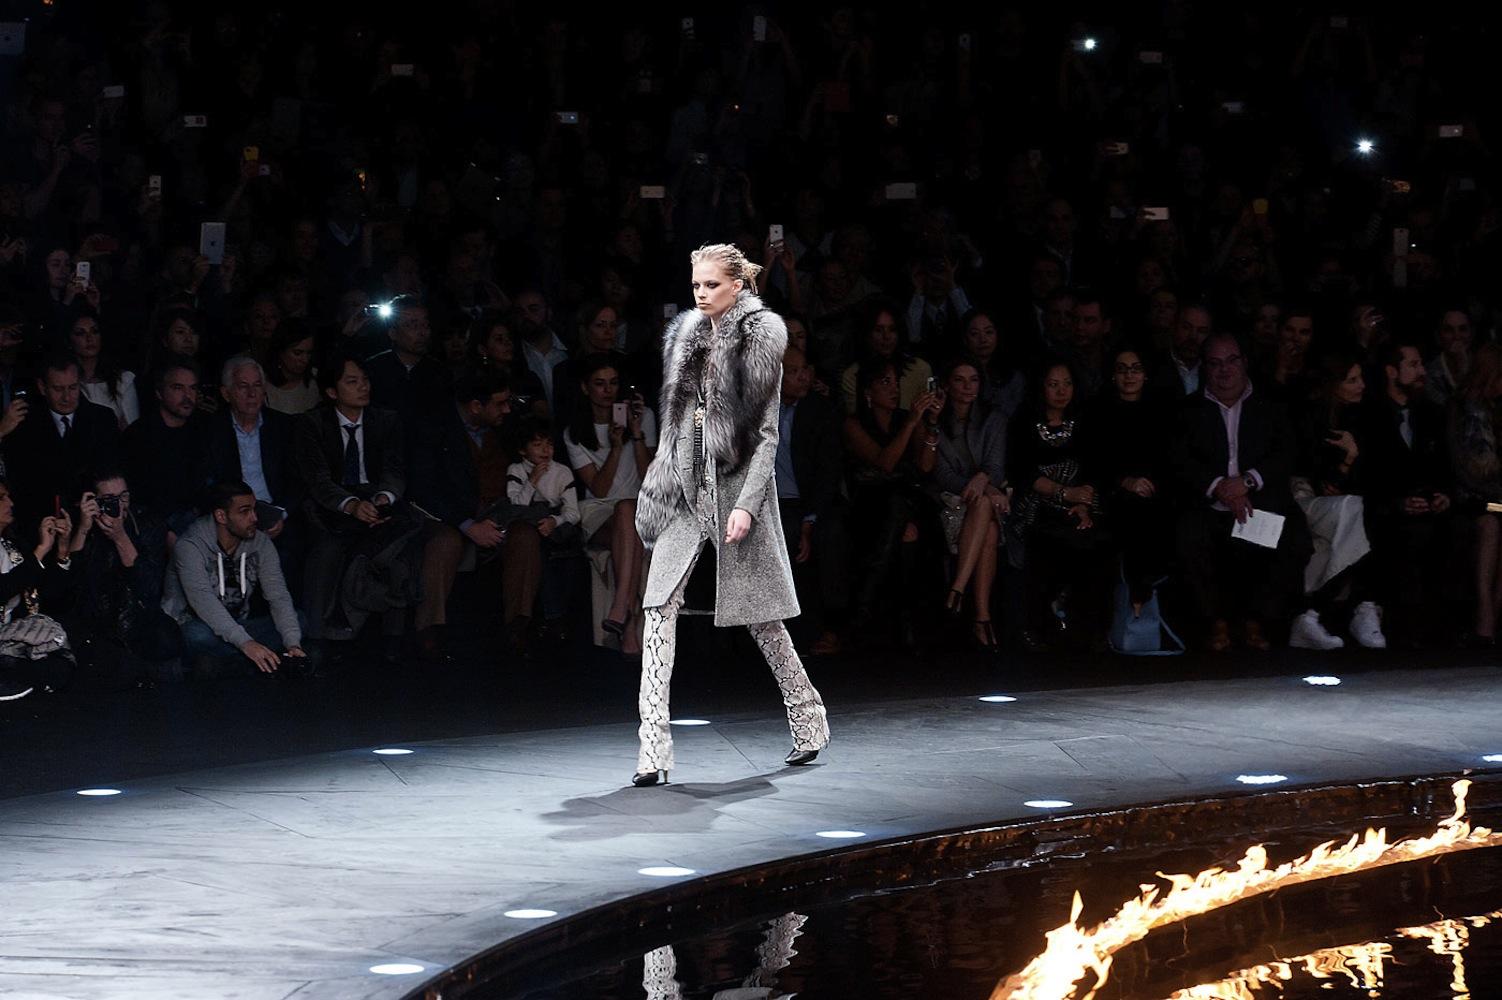 roberto-cavalli-fall-2014-show-milan-fashion-week.jpg